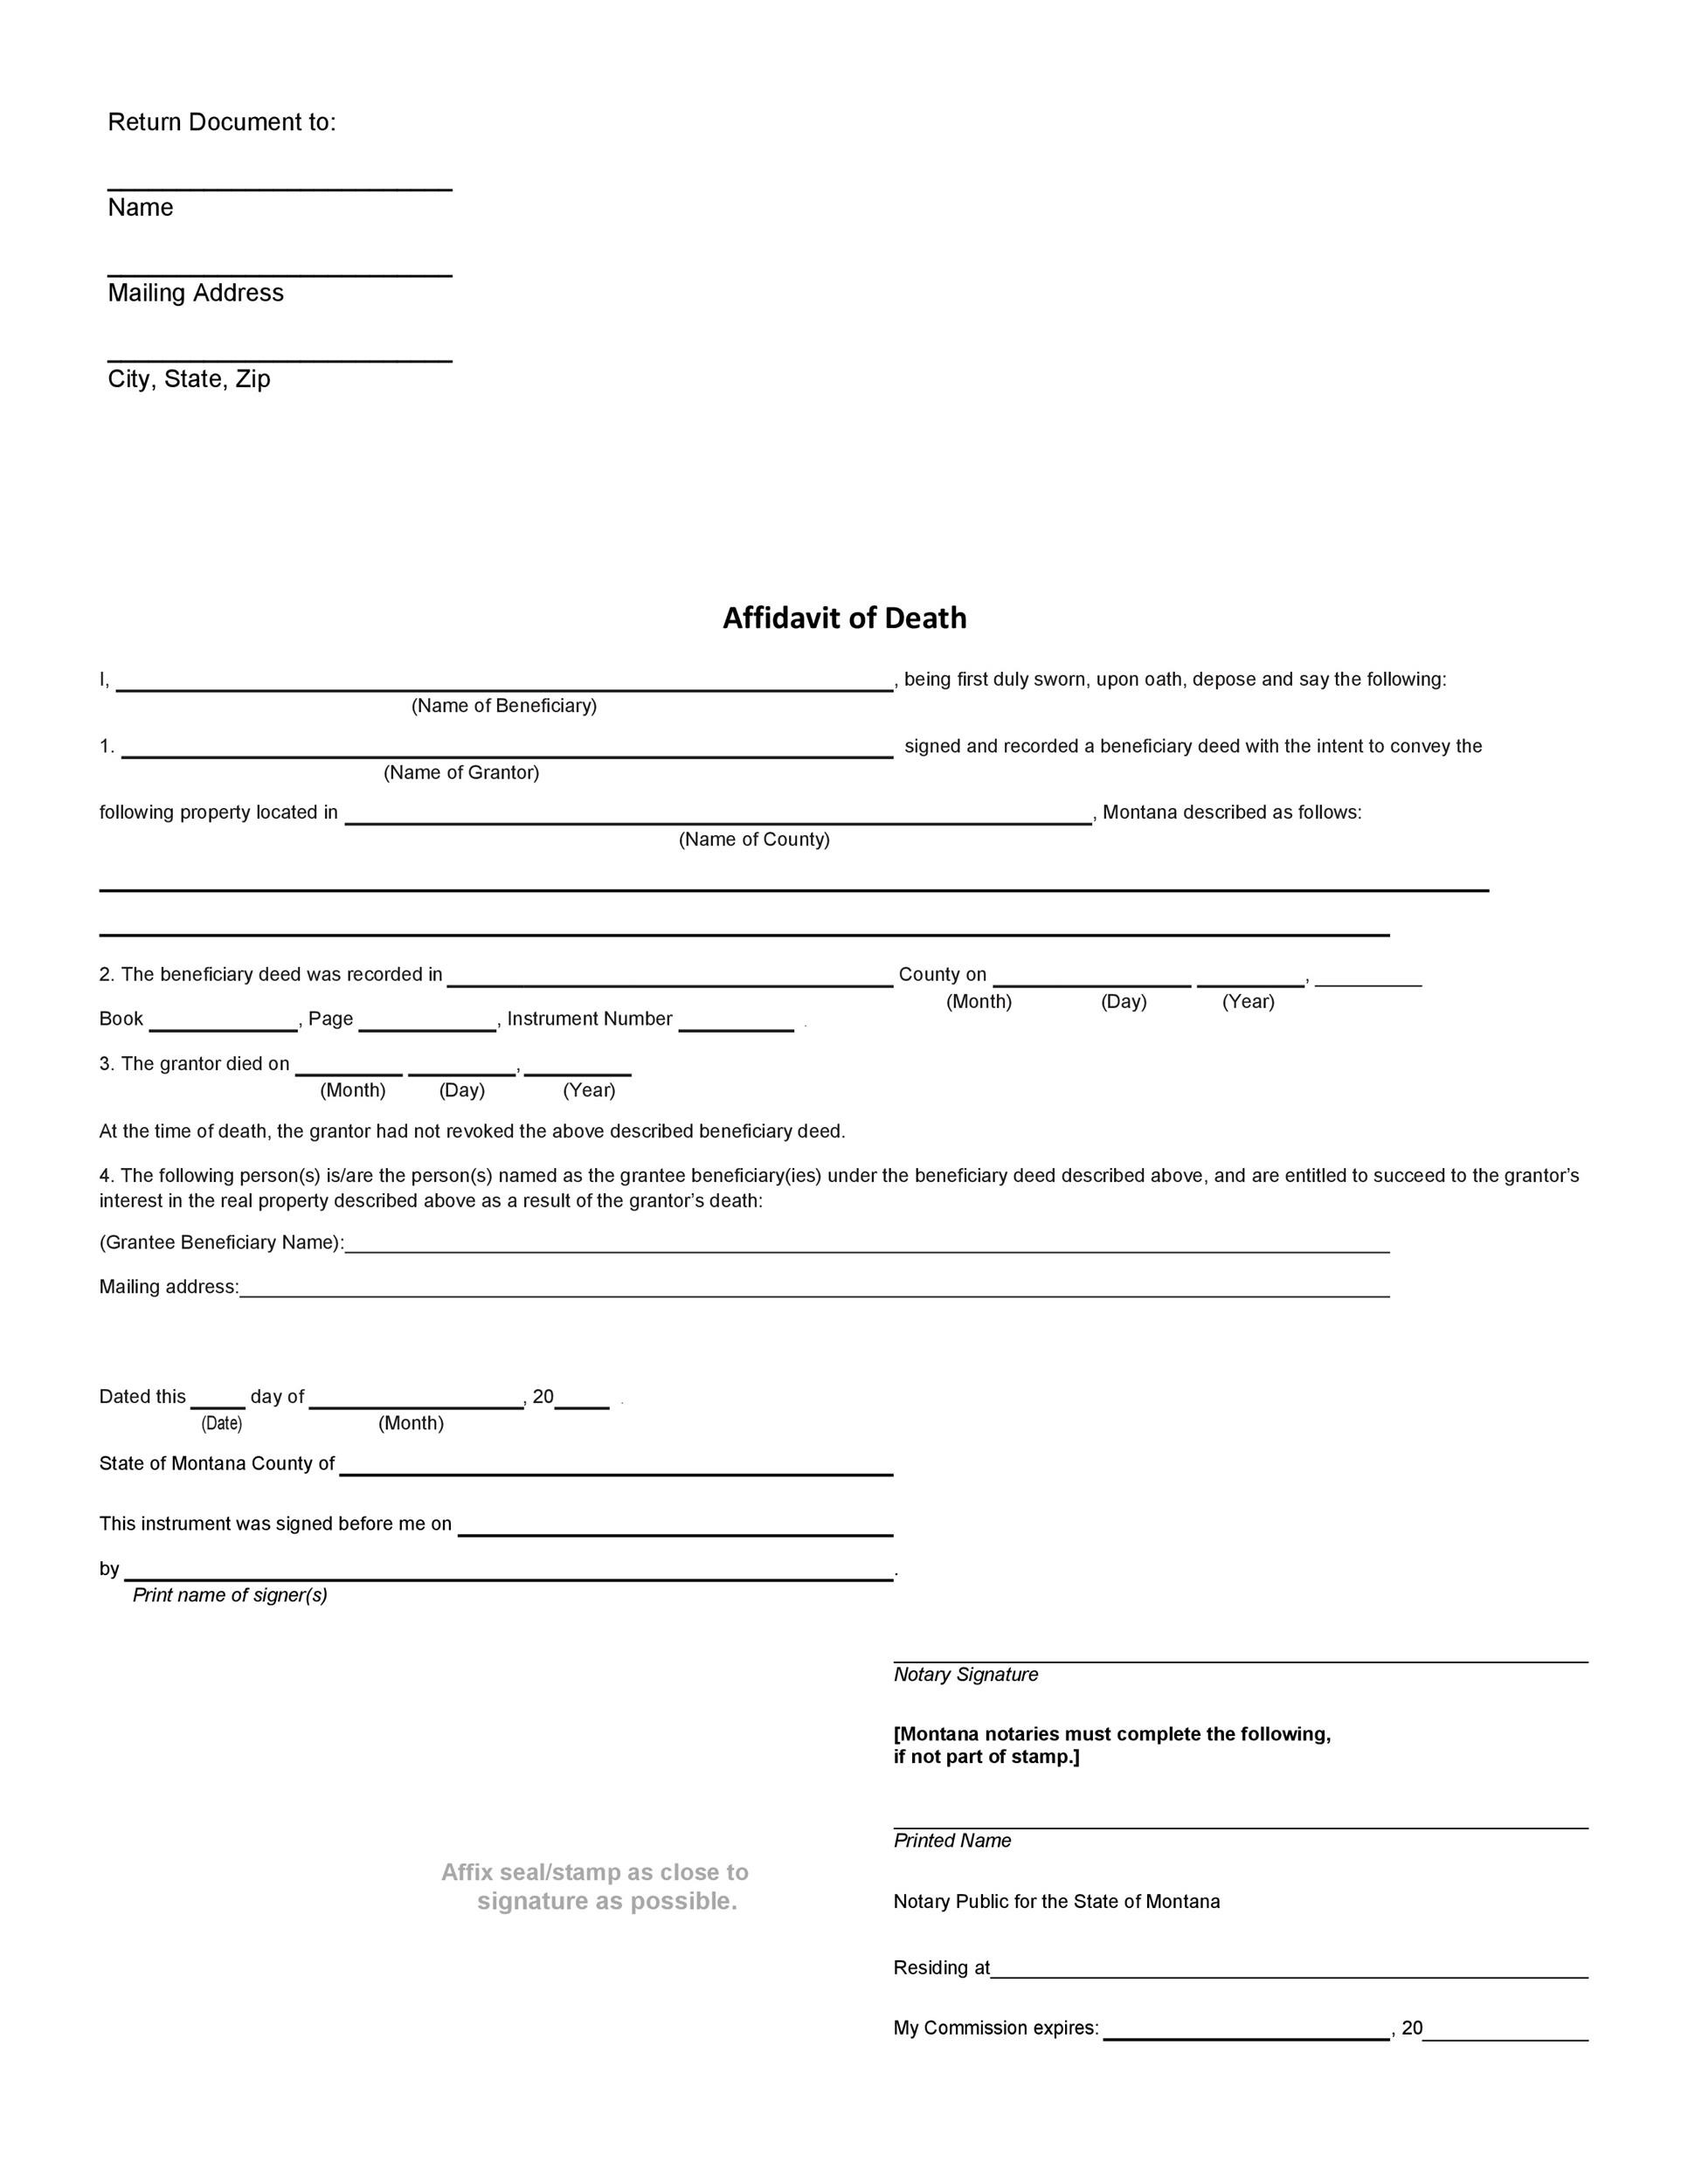 Free affidavit of death 34